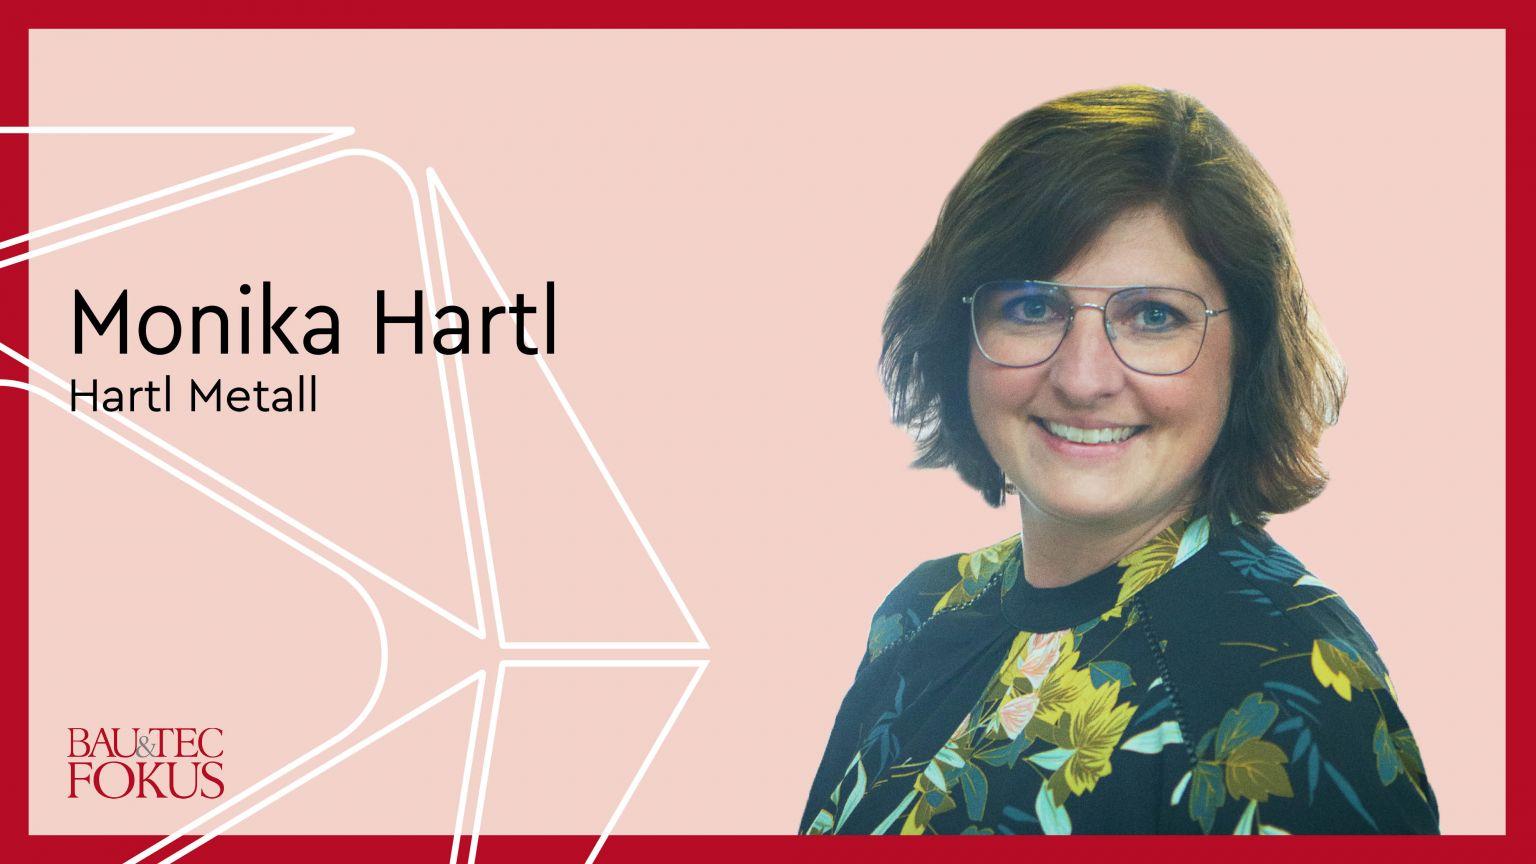 Hartl Metall bestellt Monika Hartl als zusätzliche Geschäftsführerin